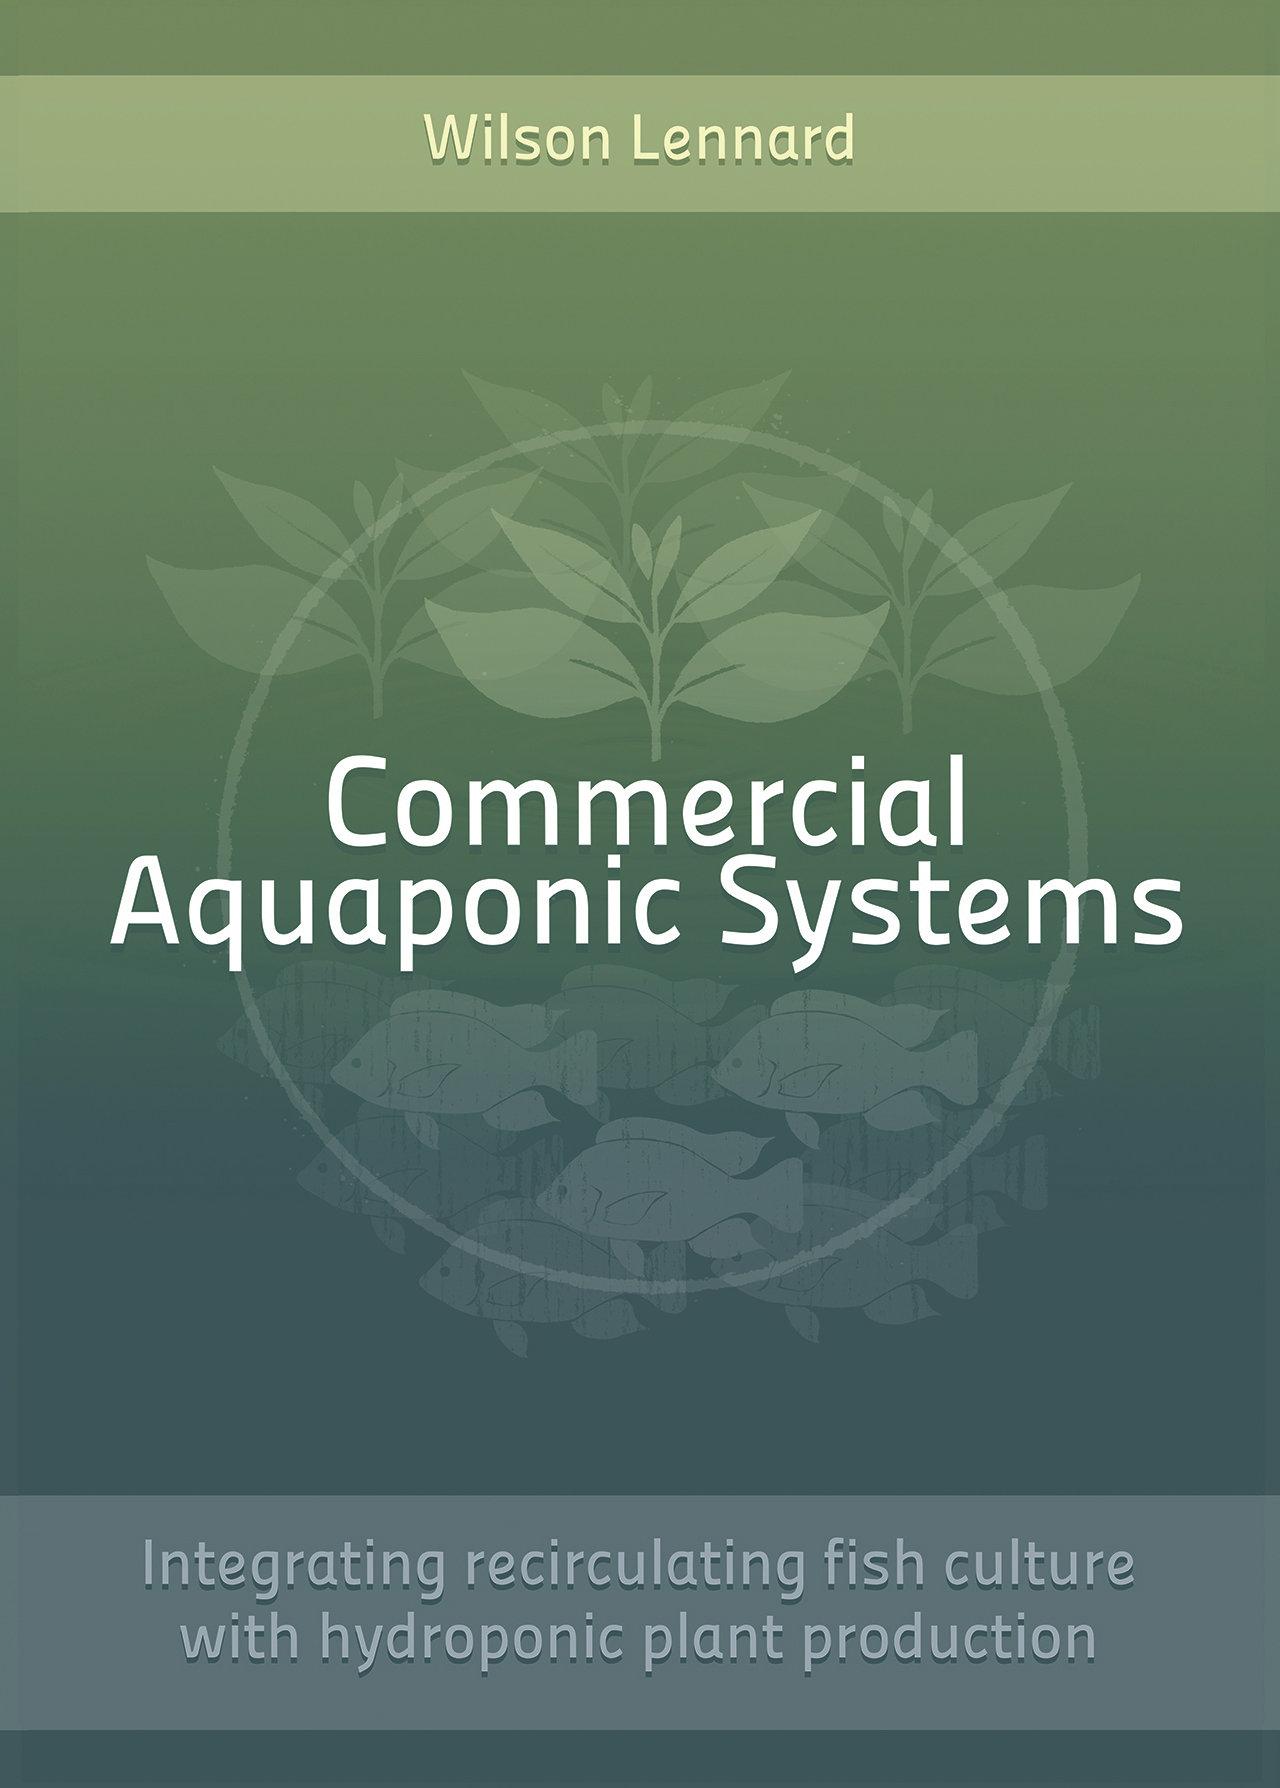 Commercial Aquaponic Systems - Digital PDF Version